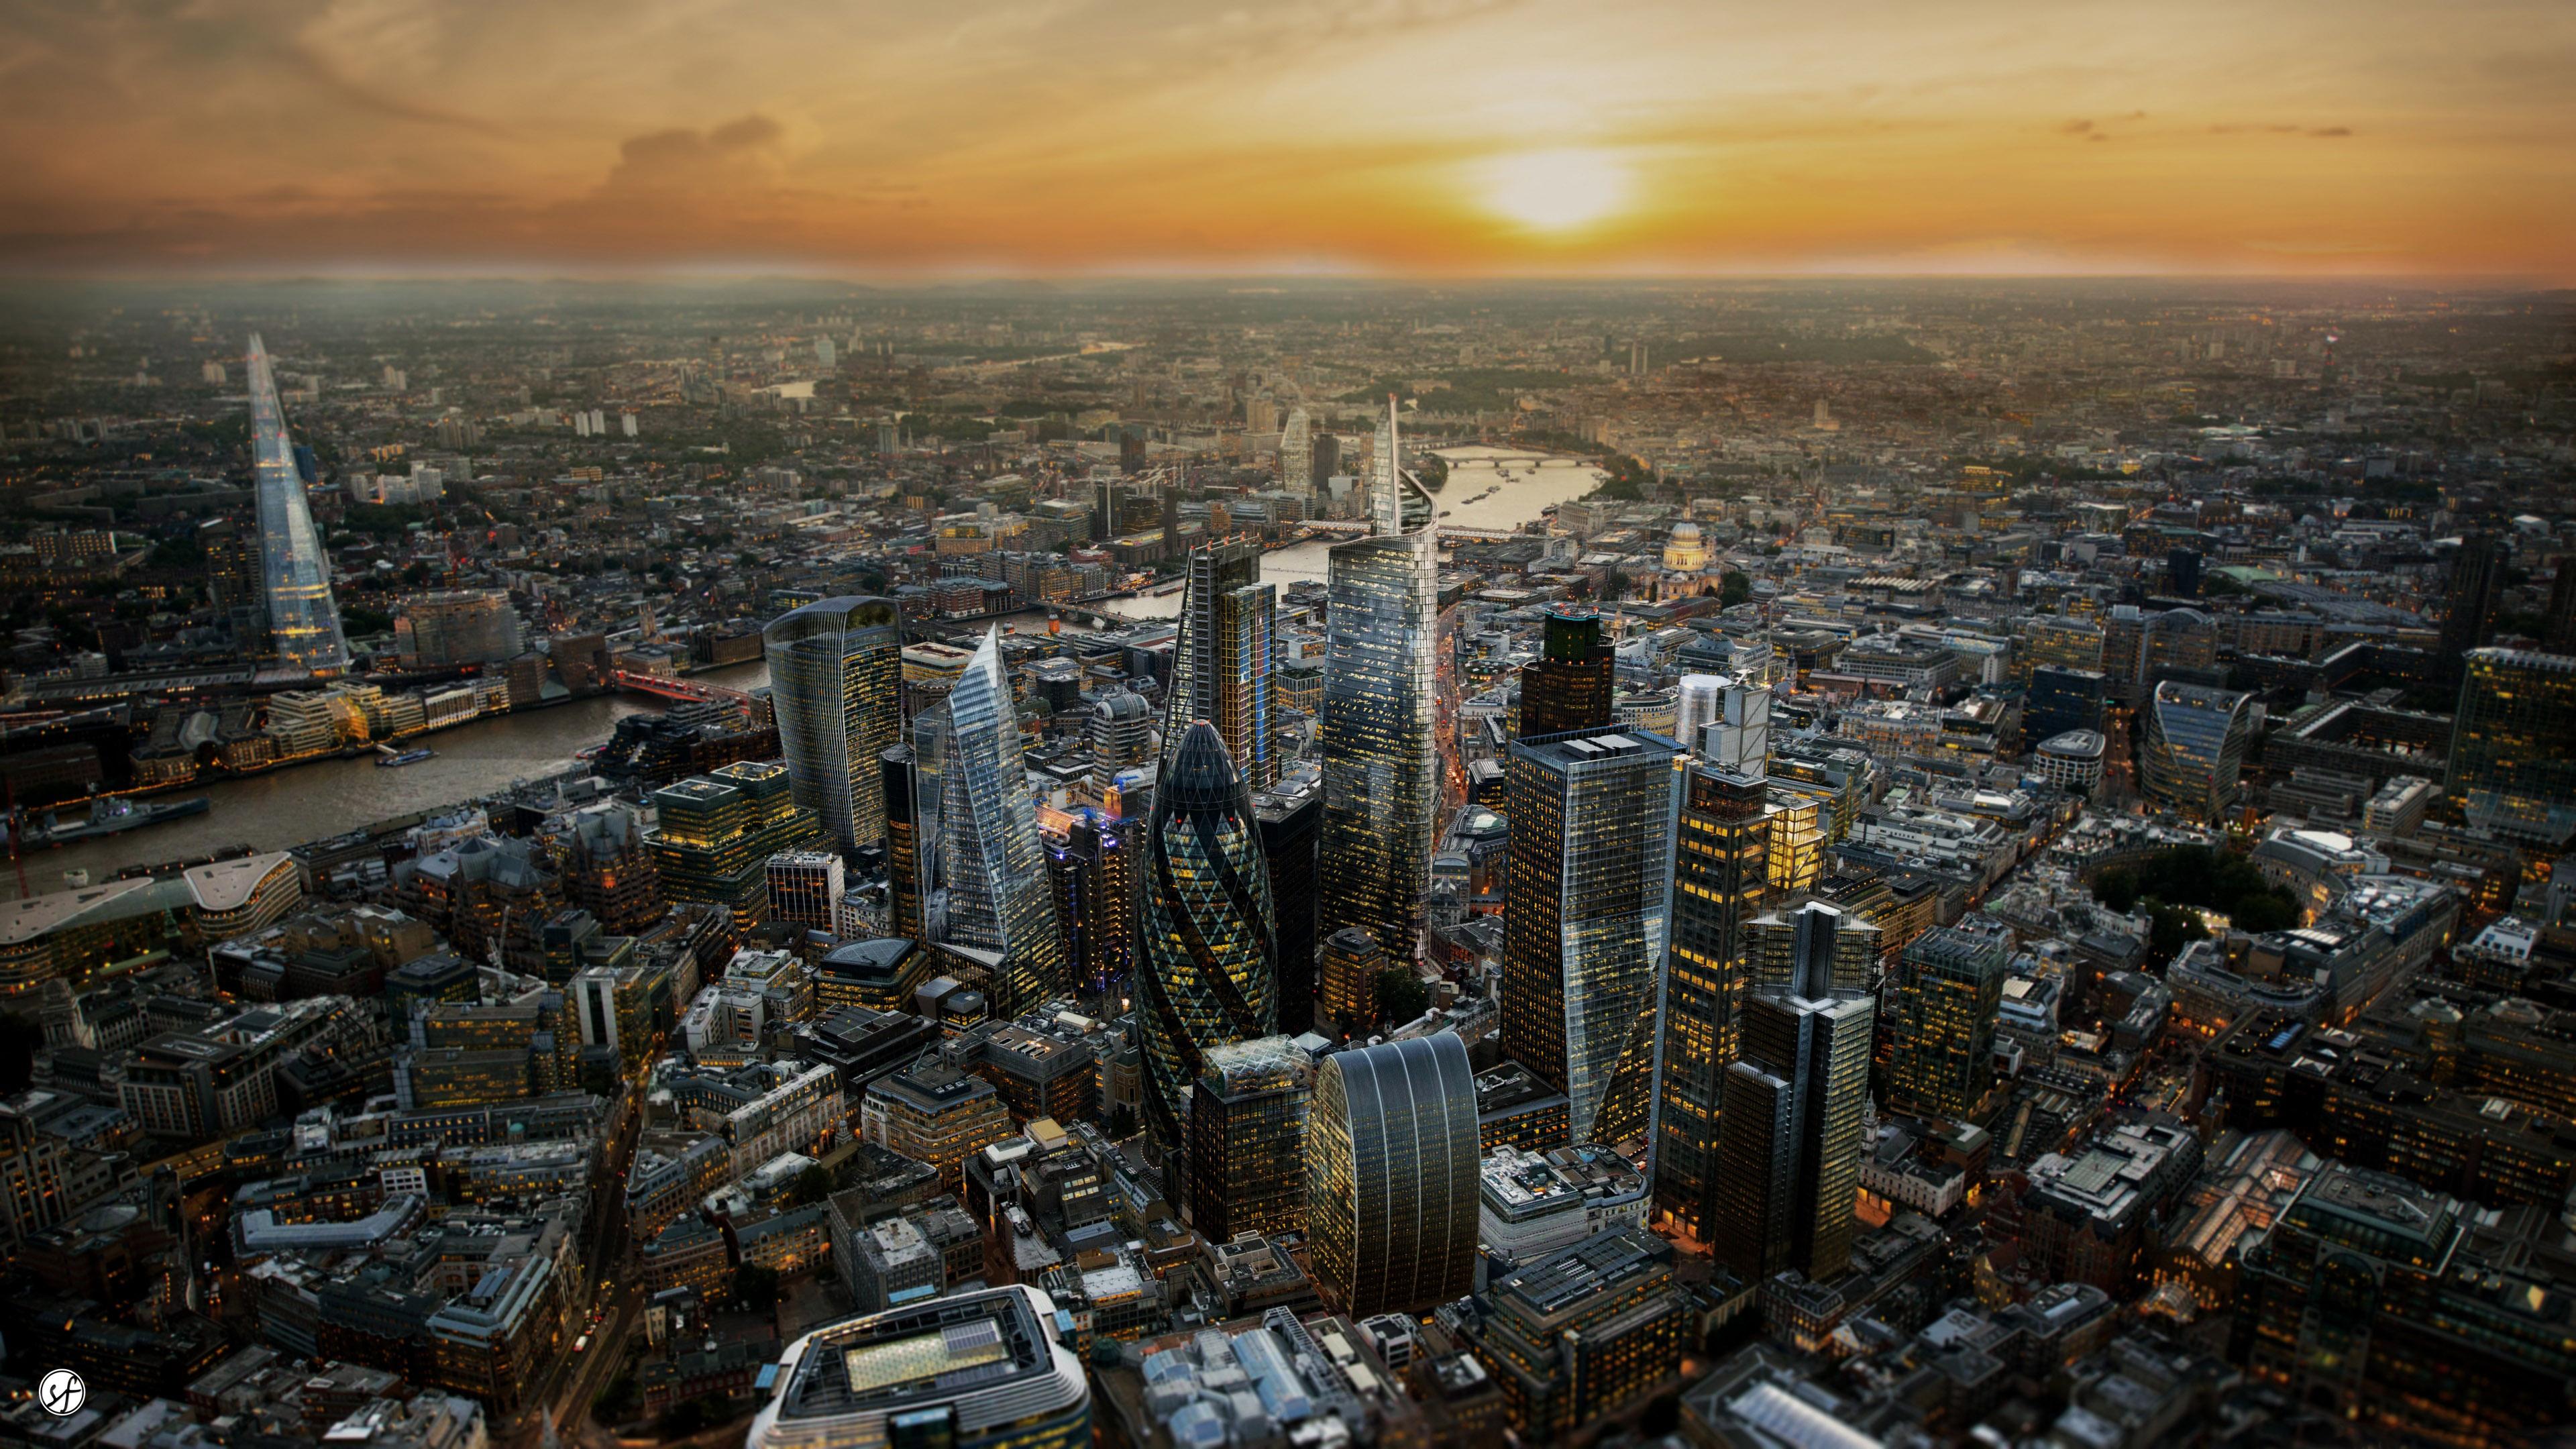 London England United Kingdom skyline at sunset 4K Wallpaper 3840x2160